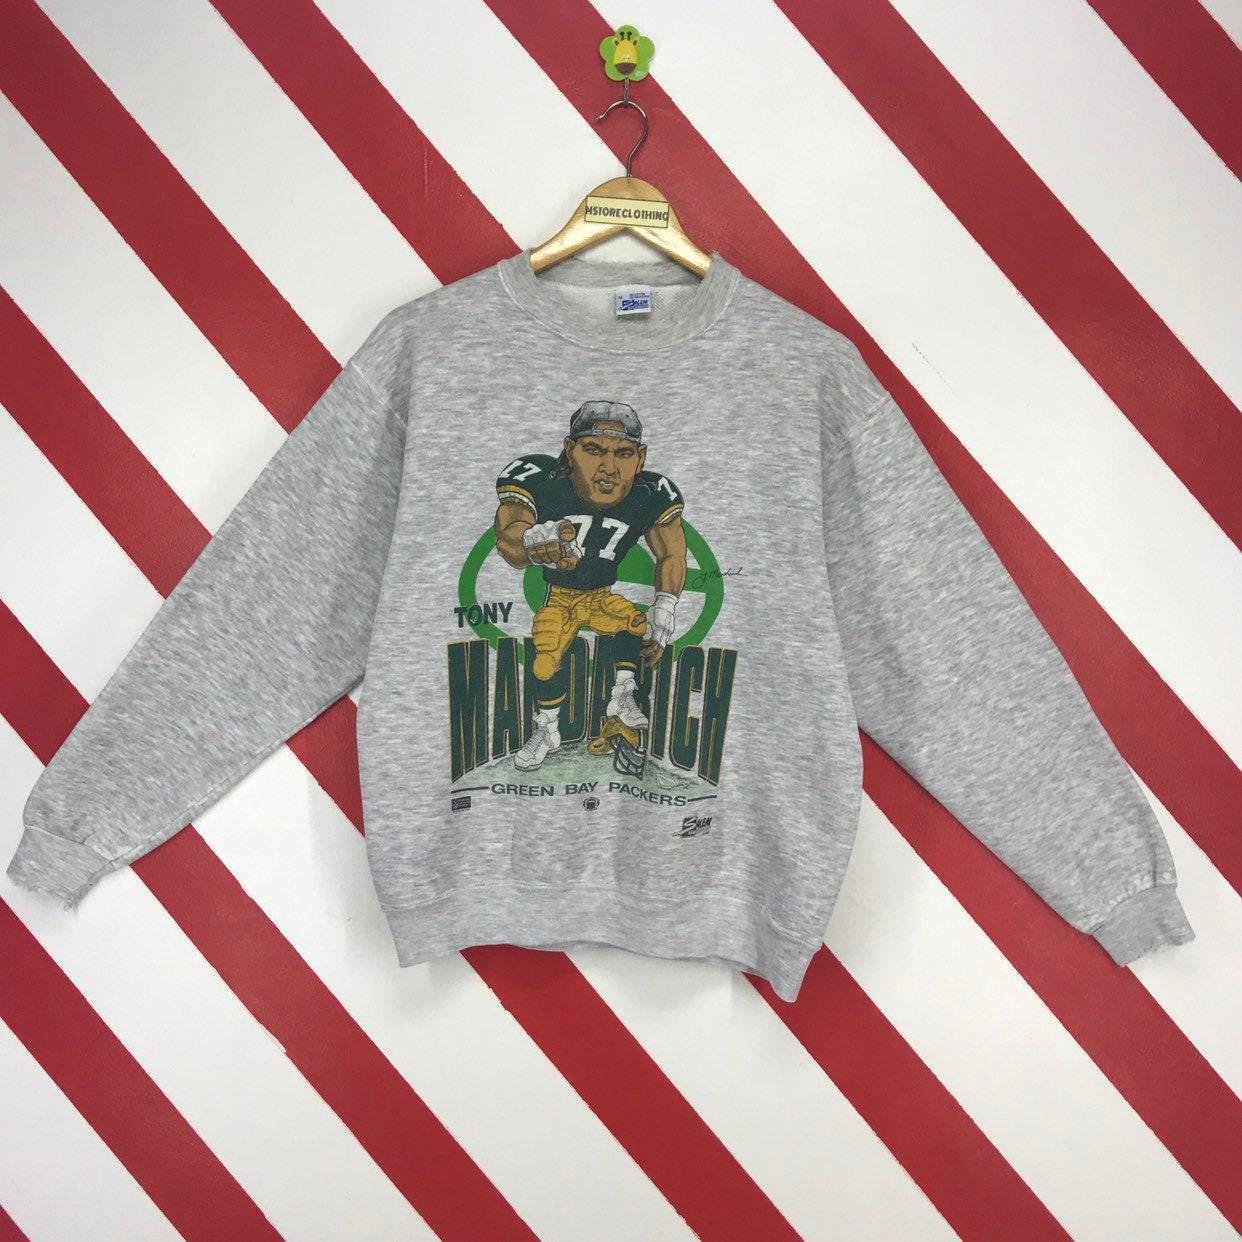 Vintage 90s Green Bay Packers Sweatshirt Tony Mandarich 77 NFL  ffbf7f626